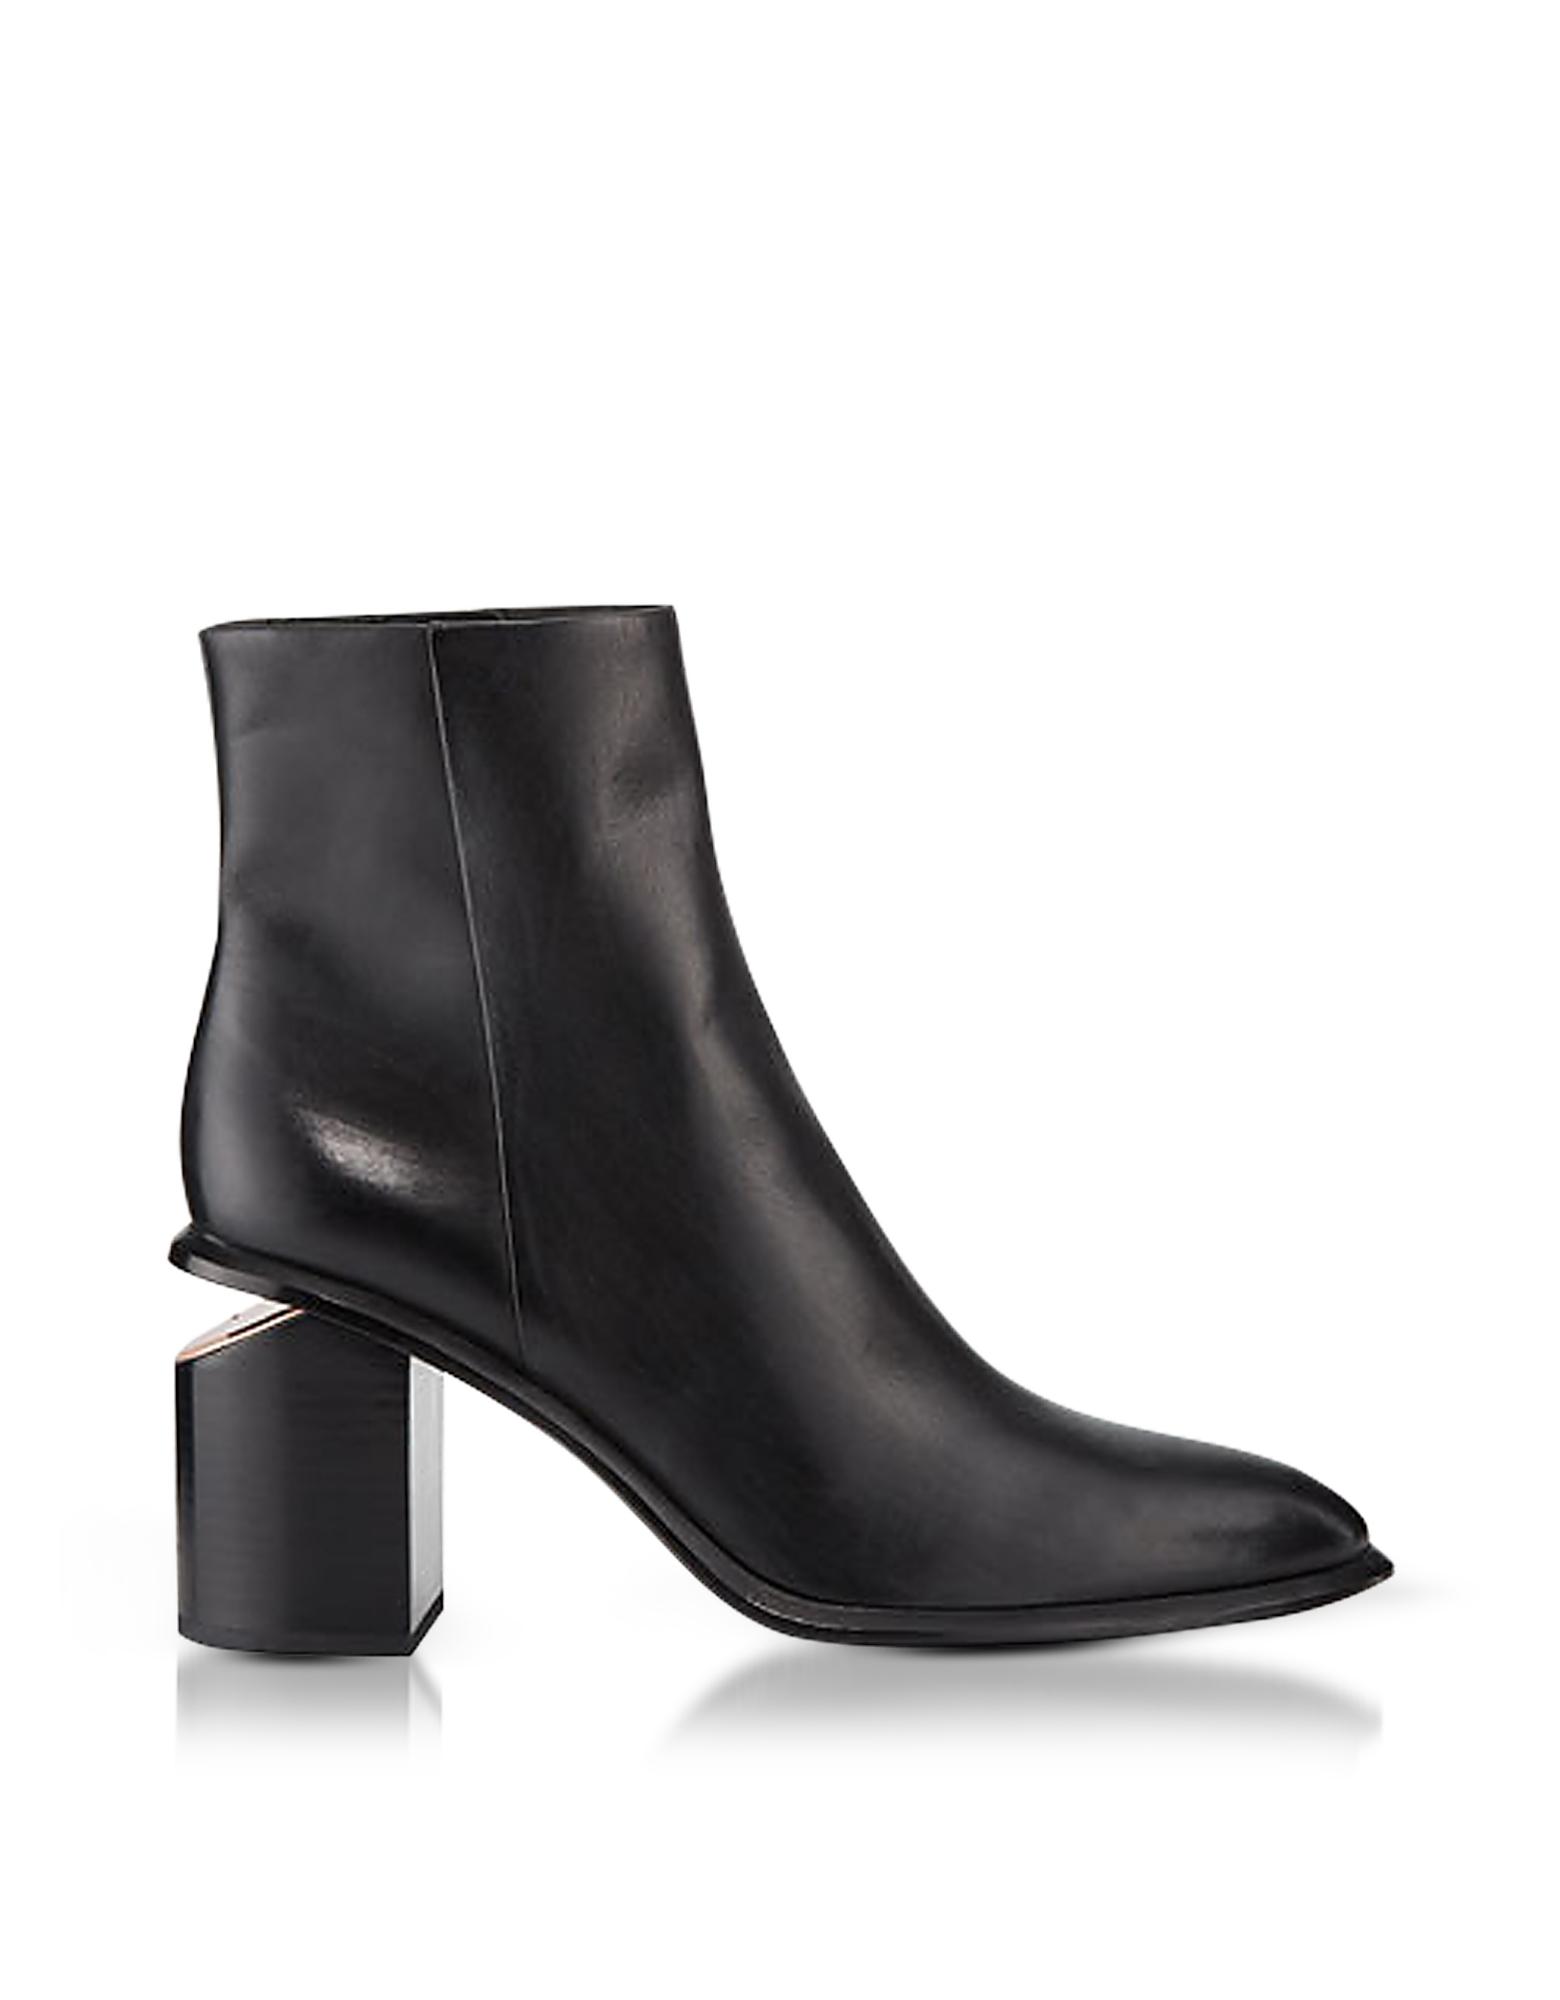 Anna Black Calf Leather Boots